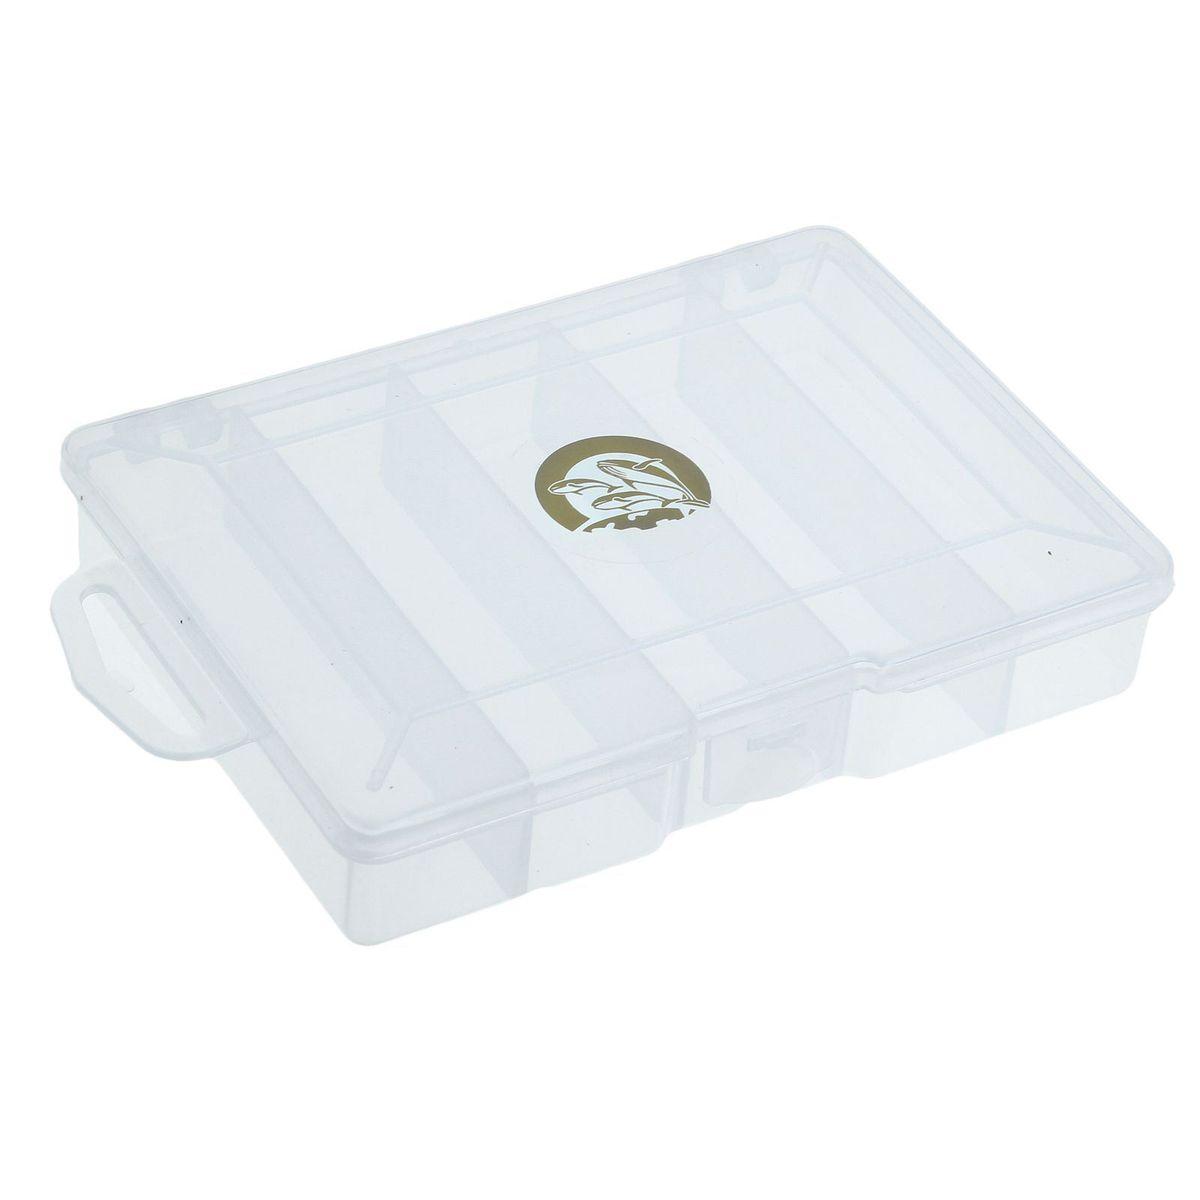 Коробка для крючков и насадок Три кита, 5 отделений, цвет: прозрачный, 15 х 10 х 3 см